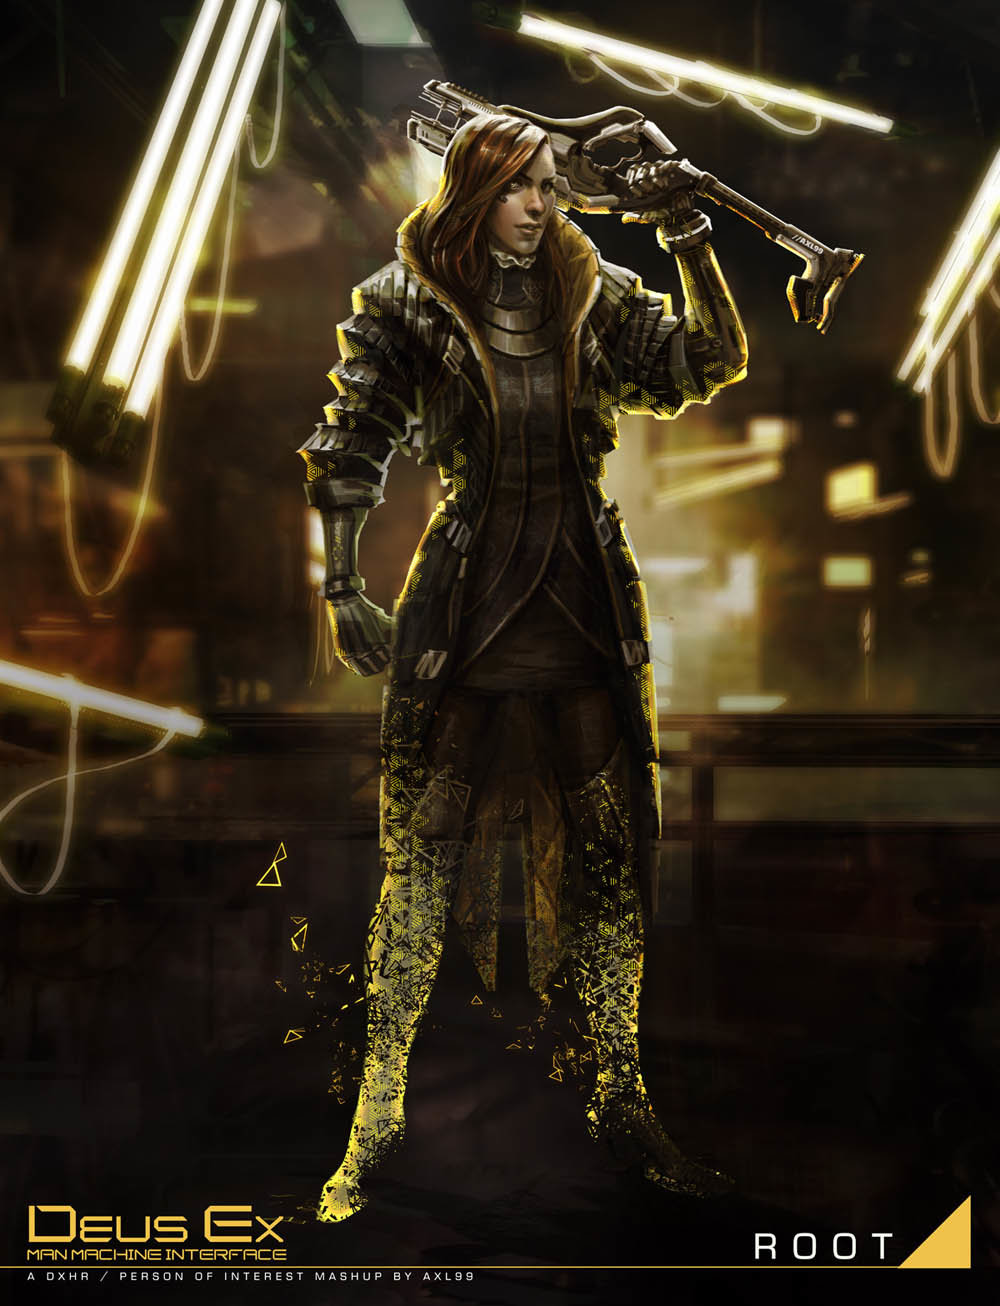 Jessie Lam Deus Ex Fan Art